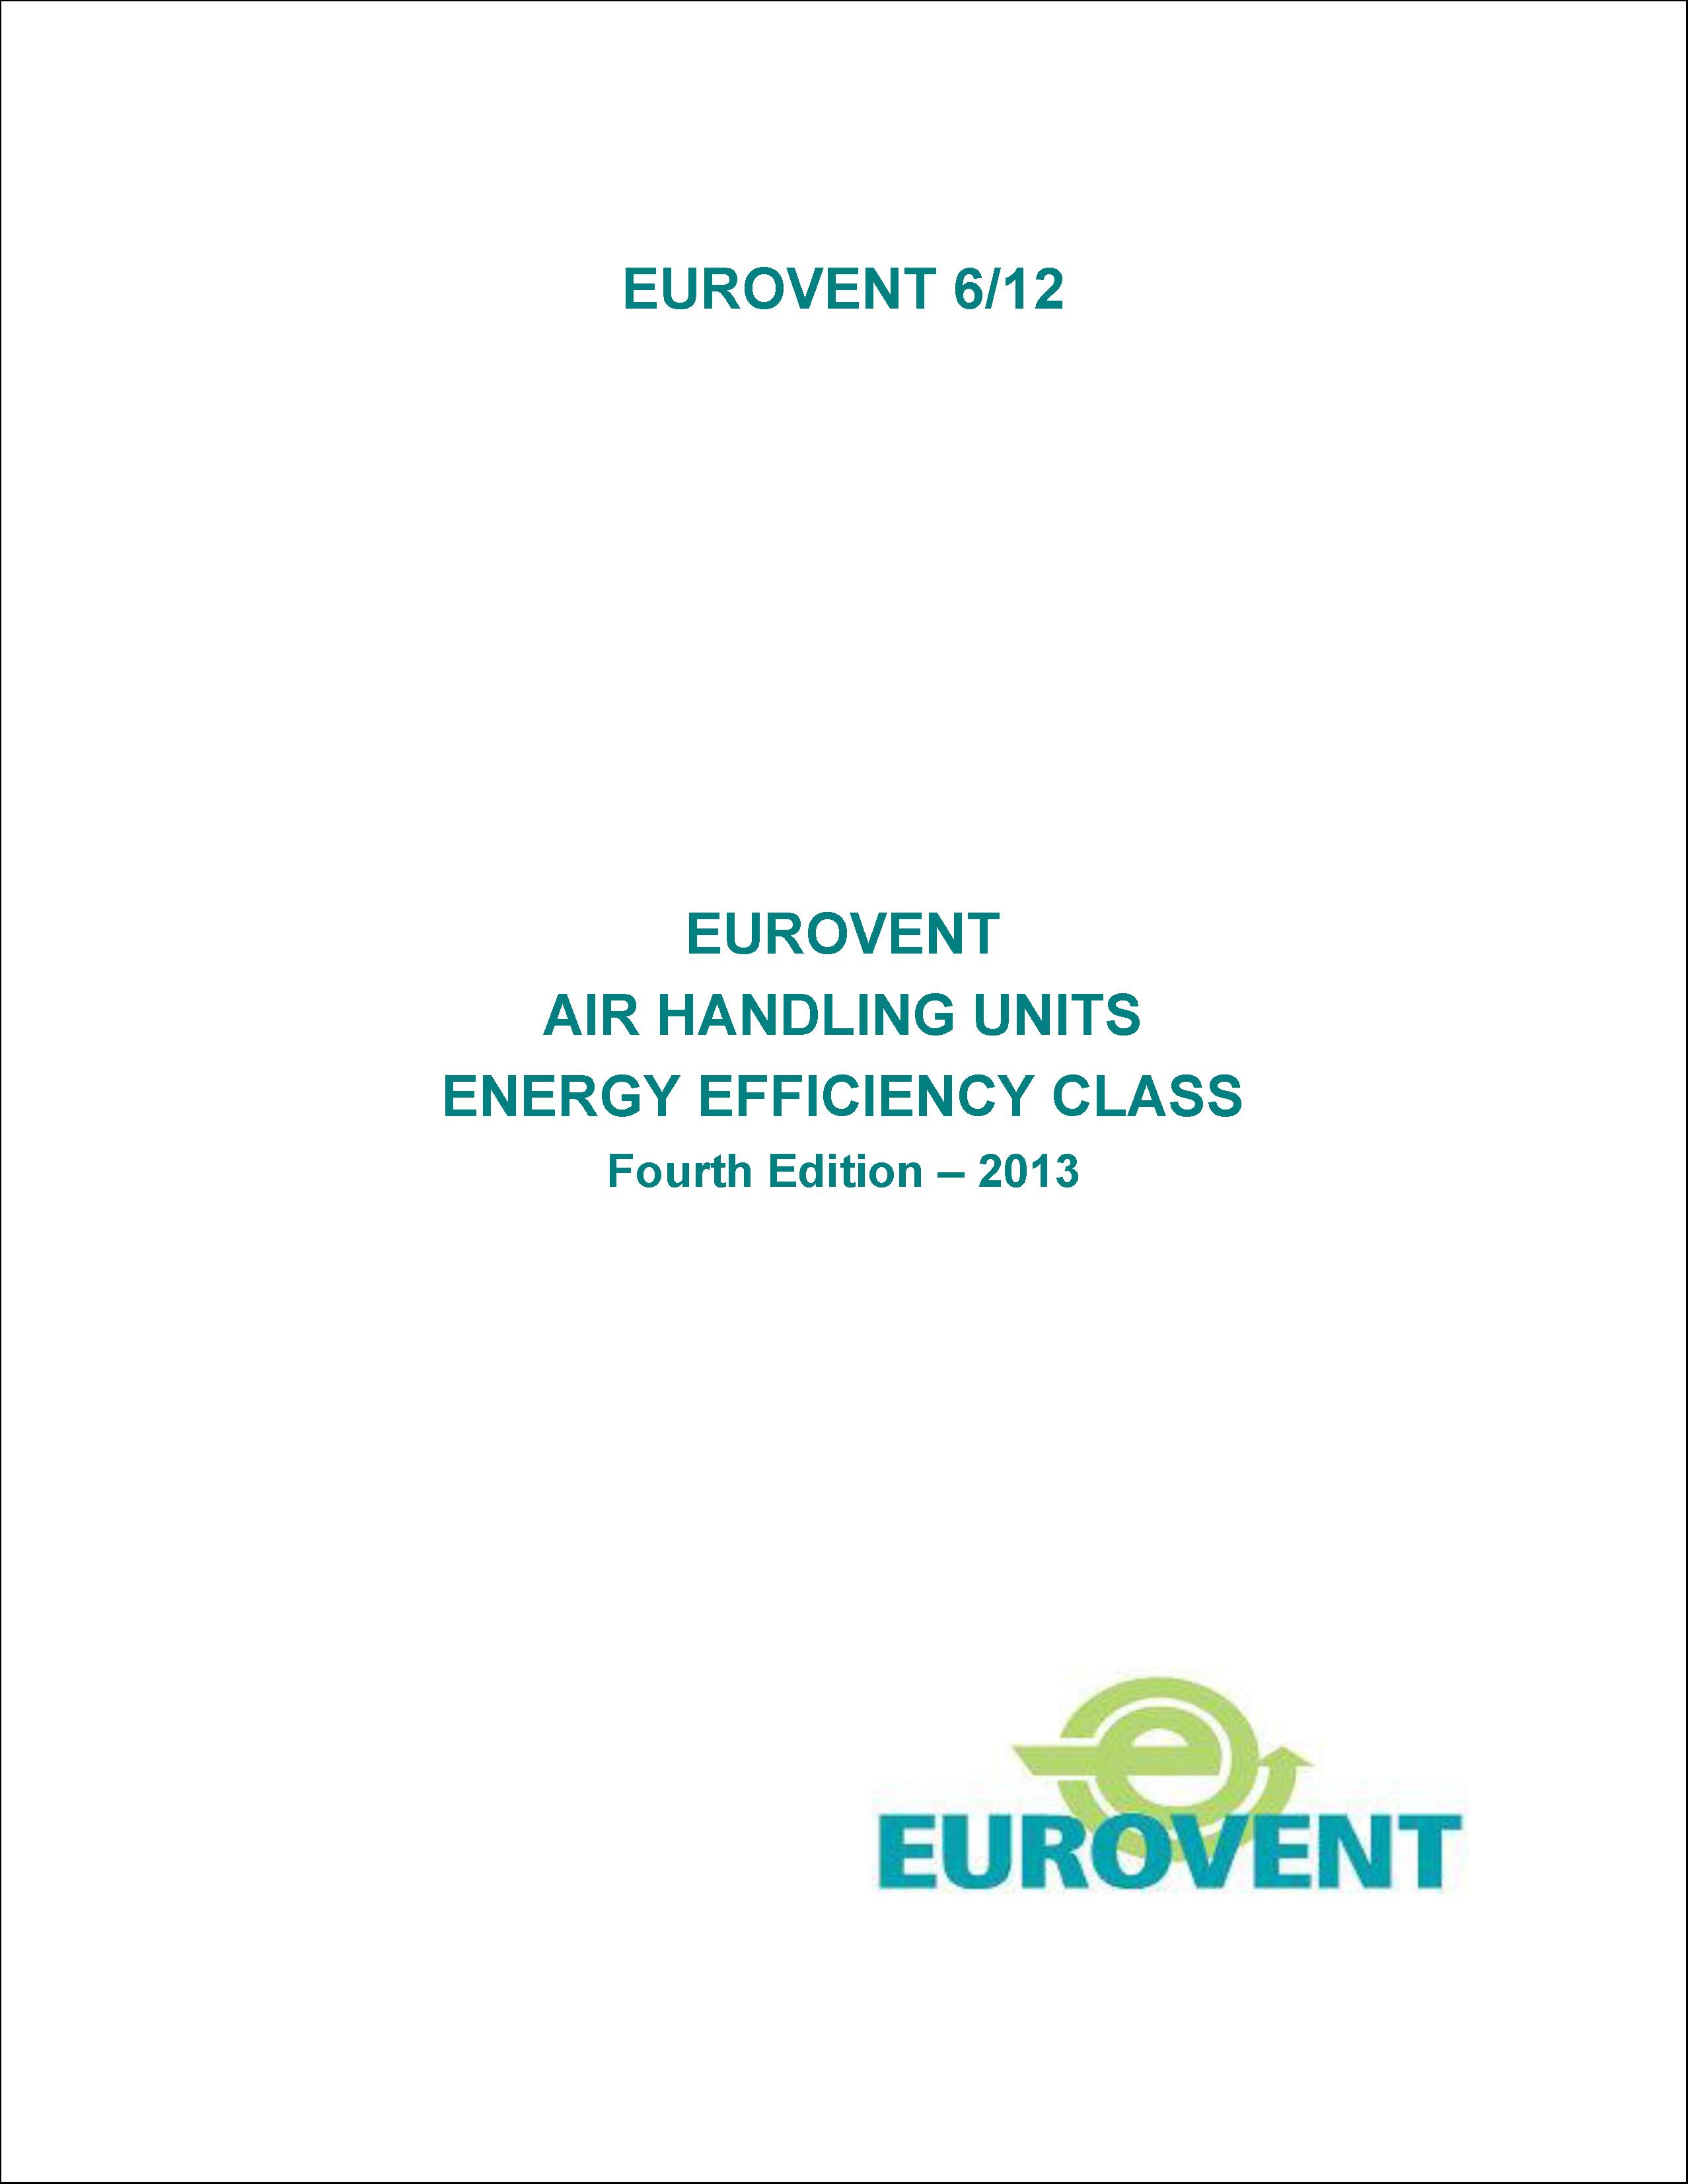 2013 - Eurovent air handling units energy efficiency class